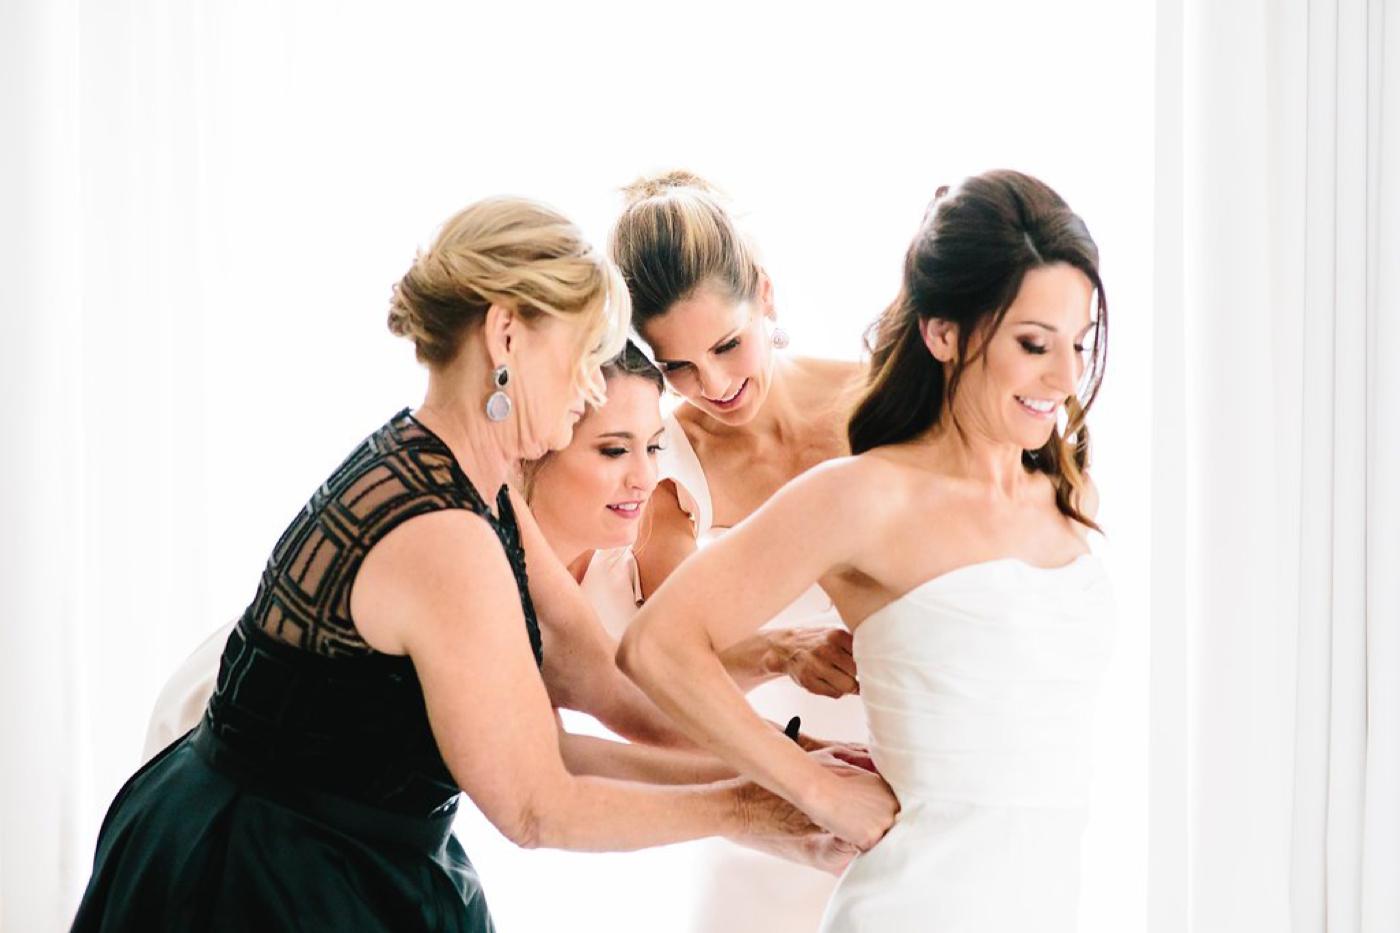 chicago-fine-art-wedding-photography-sakamuri7